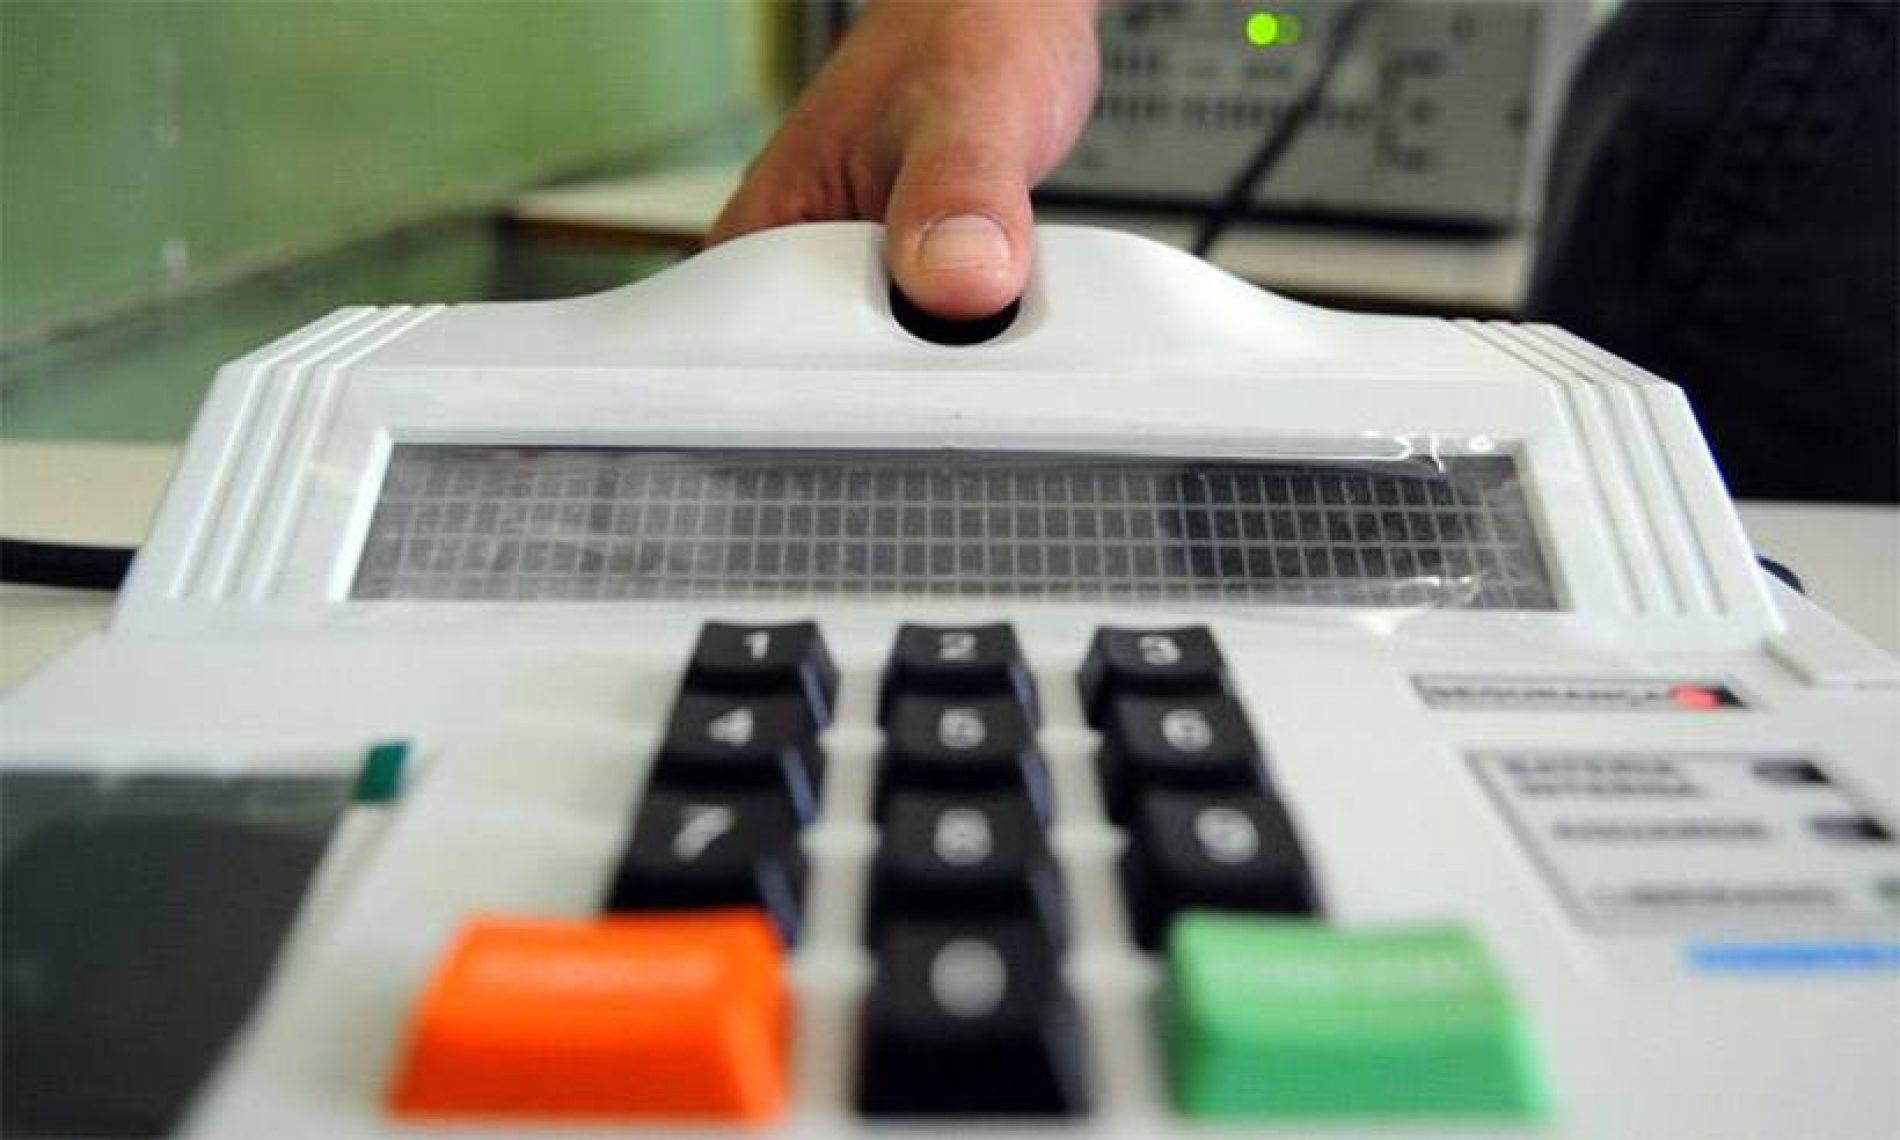 Datafolha: Pesquisa espontânea mostra índice elevado de votos brancos ou nulos